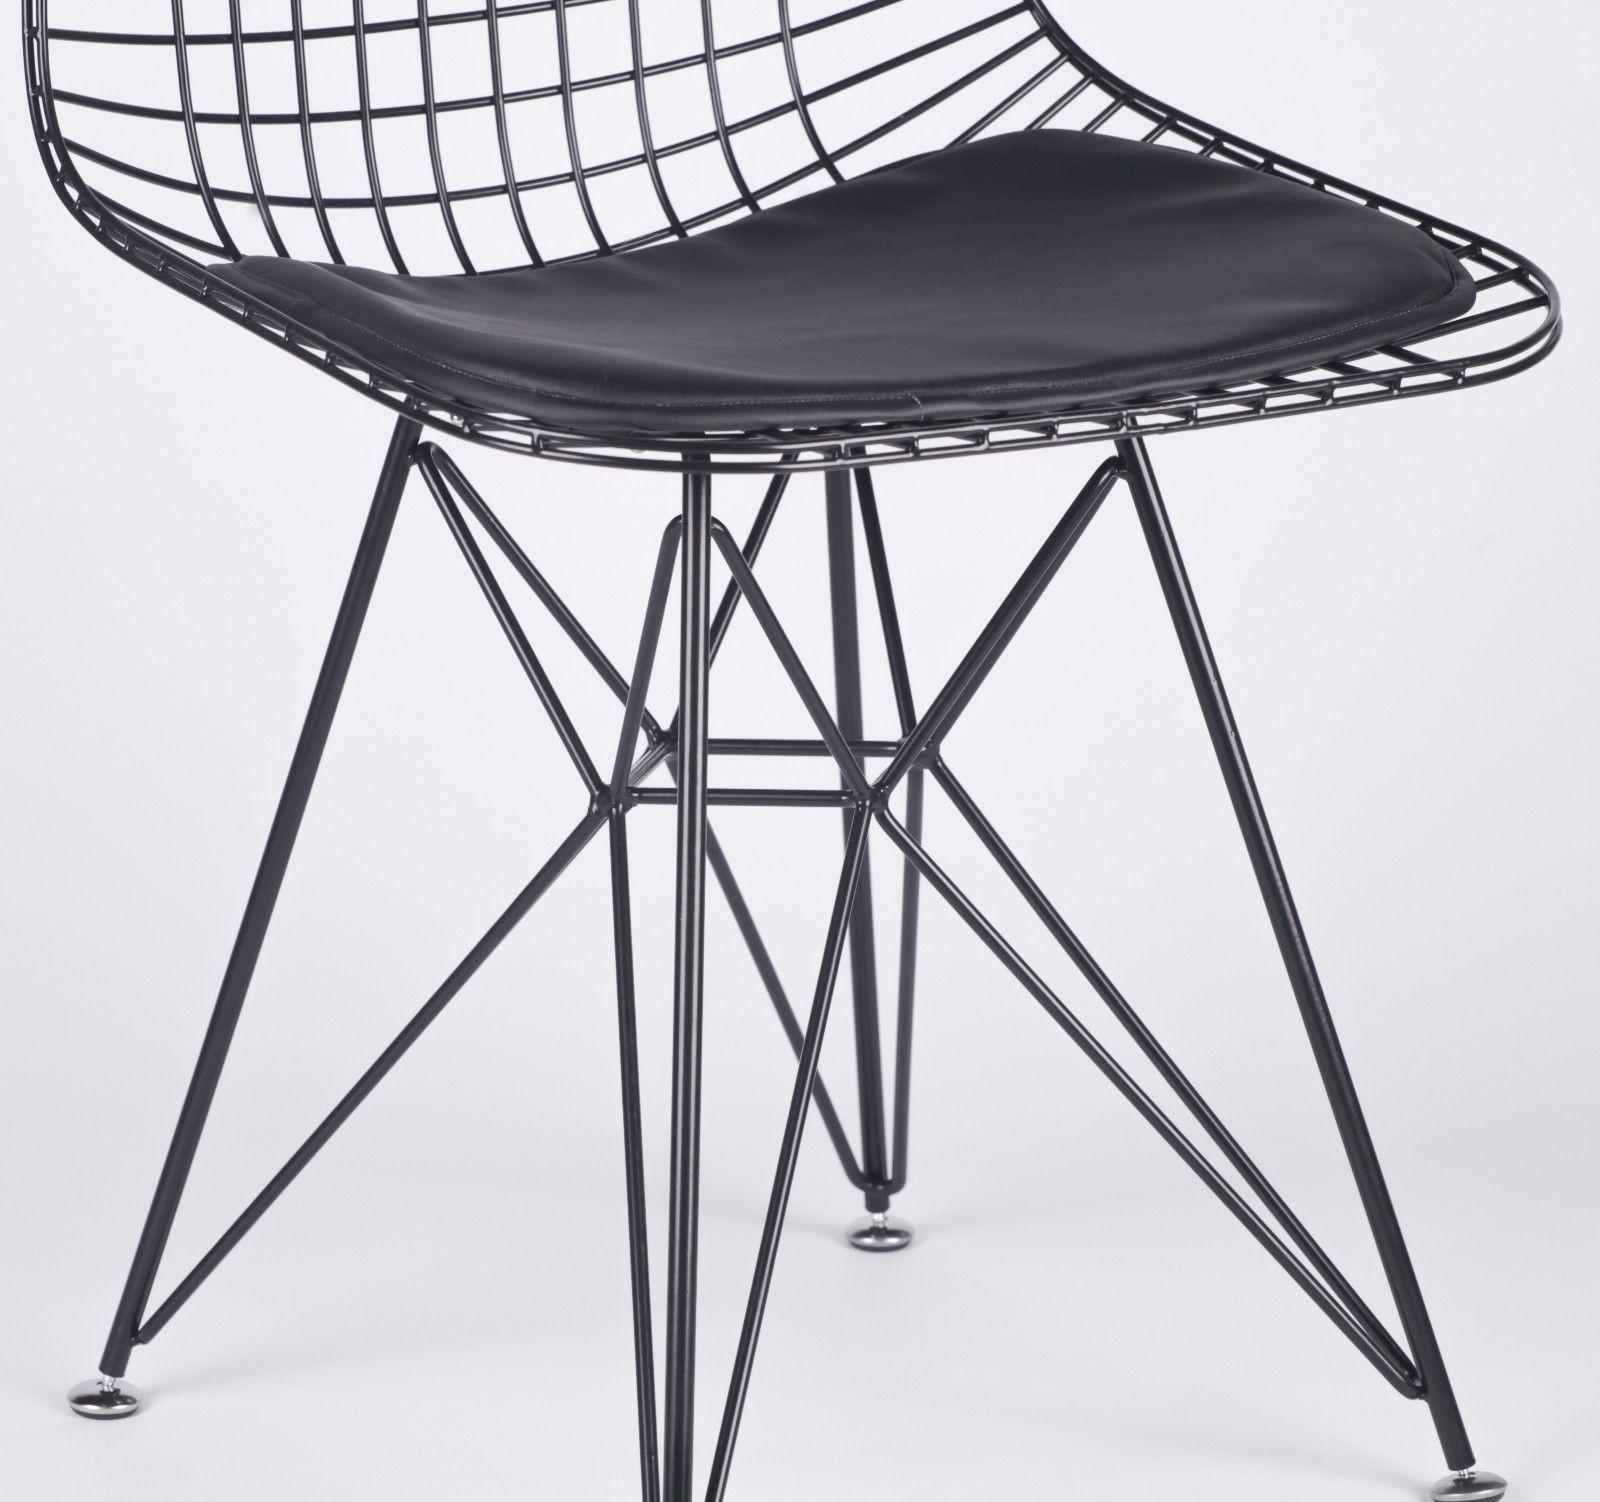 wire mesh dining chairs uk cloud nine chair black eiffel style furniture la